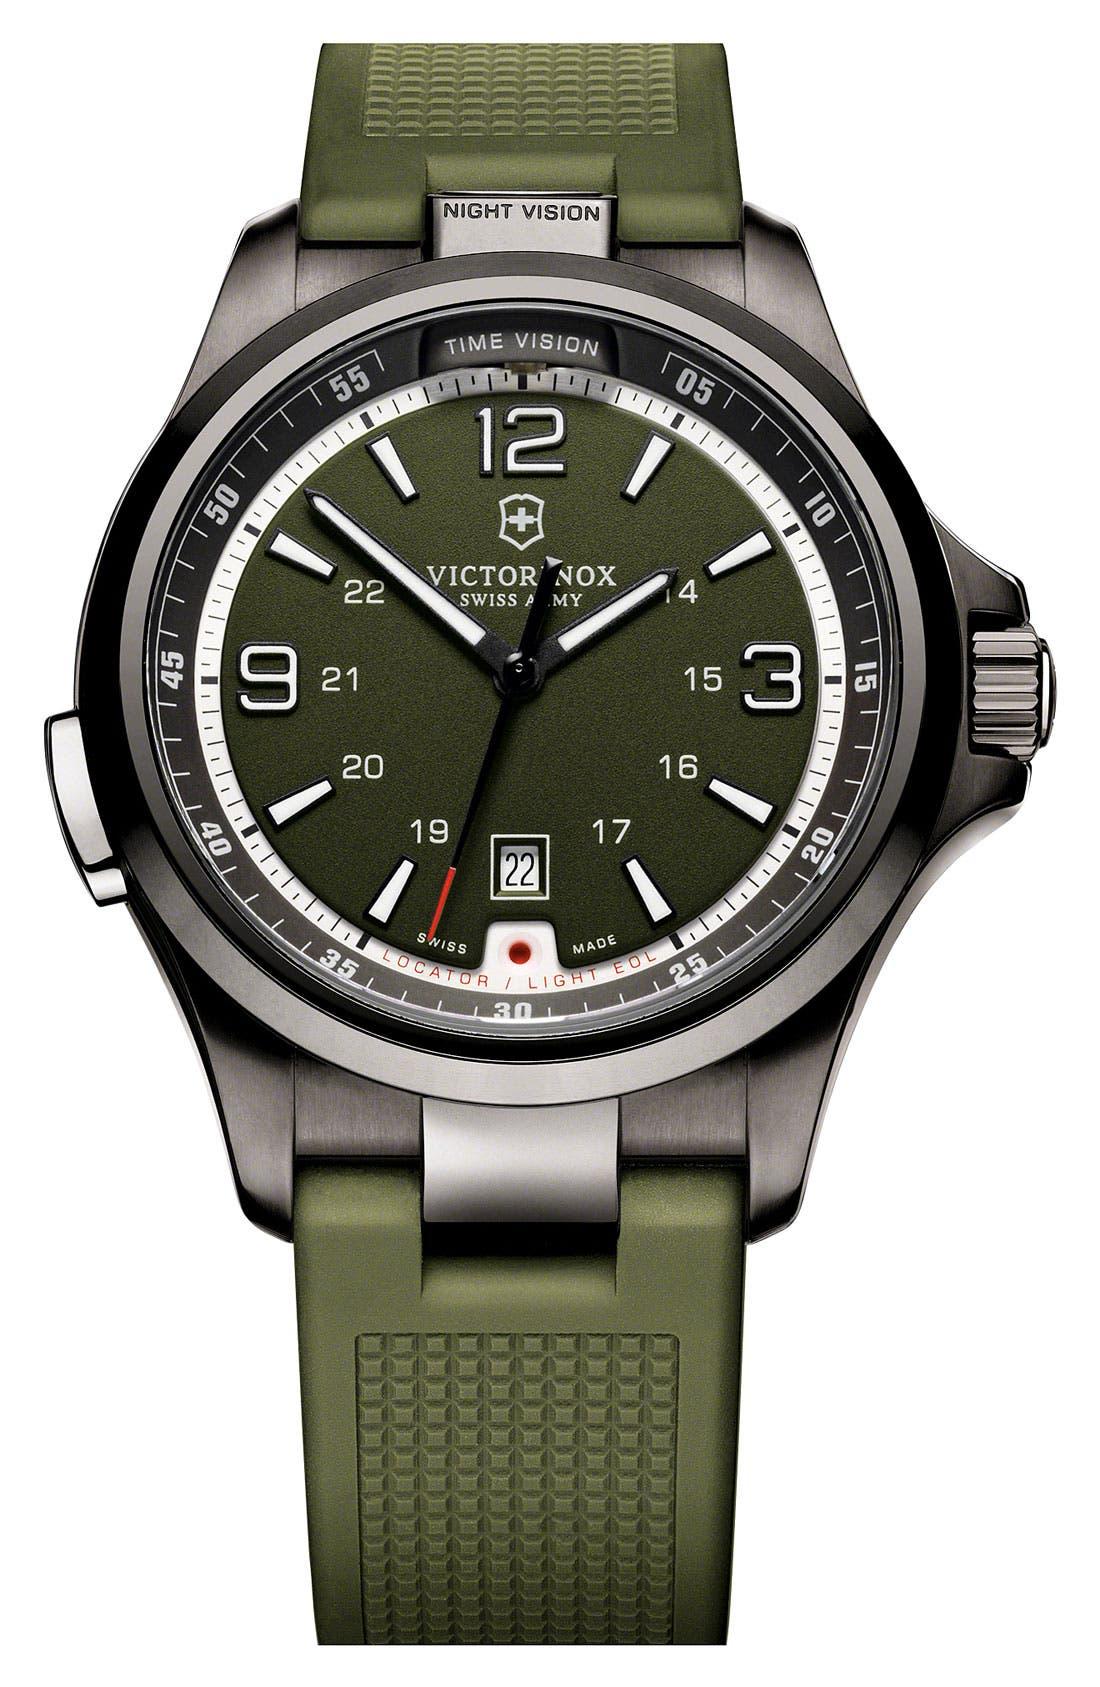 Main Image - Victorinox Swiss Army® 'Night Vision' Rubber Strap Watch, 42mm